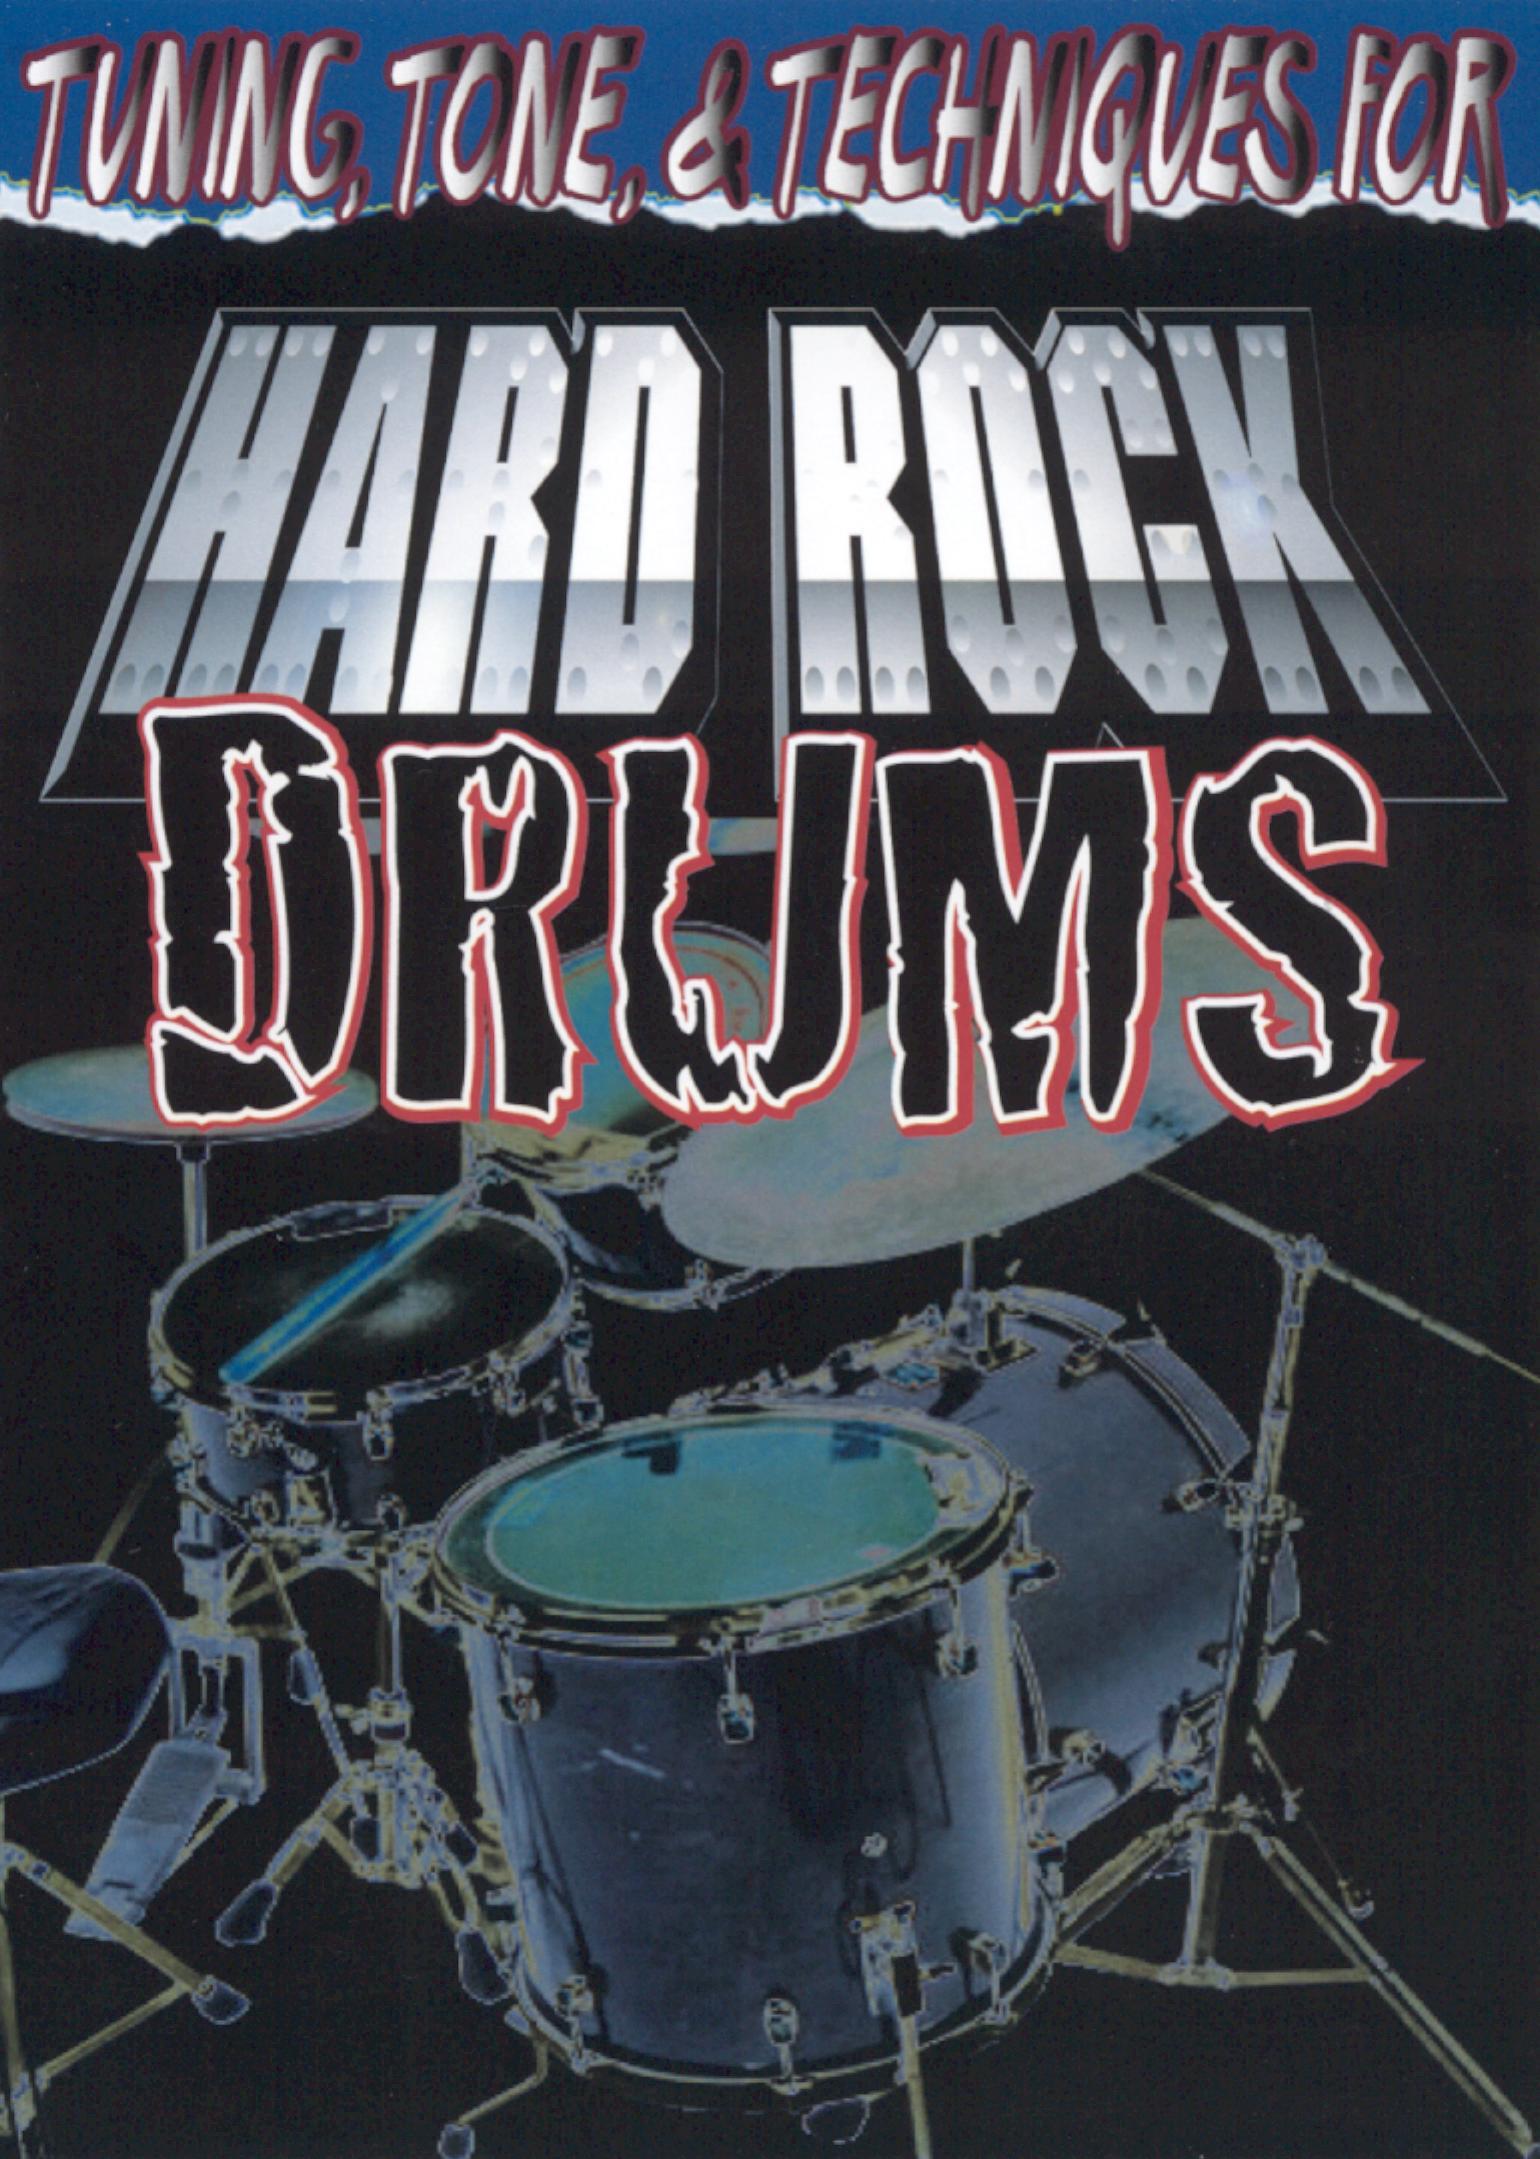 Hot Drum: Hard Rock Drums